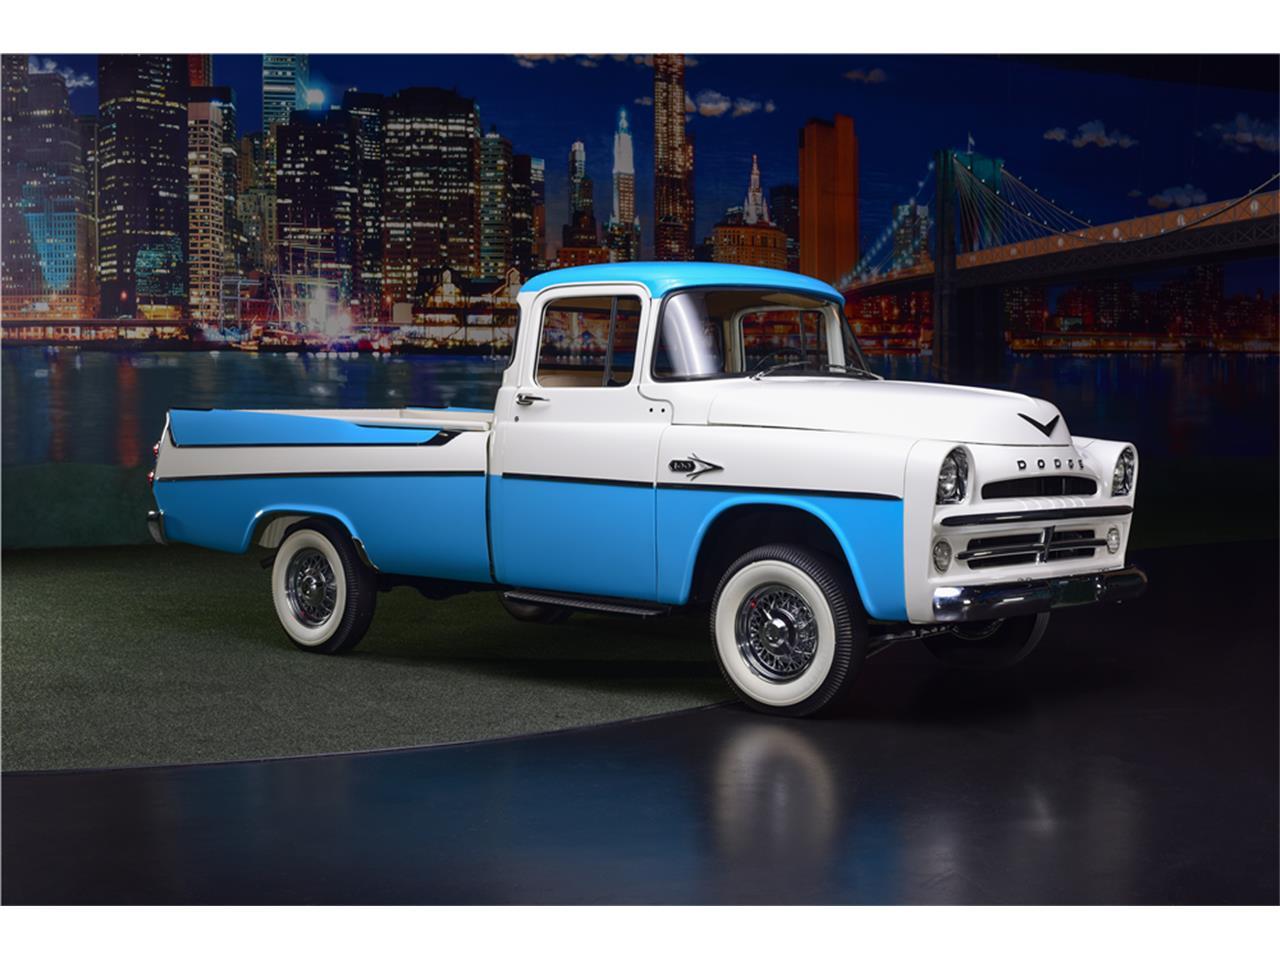 1965 Chrysler Newport Convertible Additionally 1950 Chevy Truck Wiring